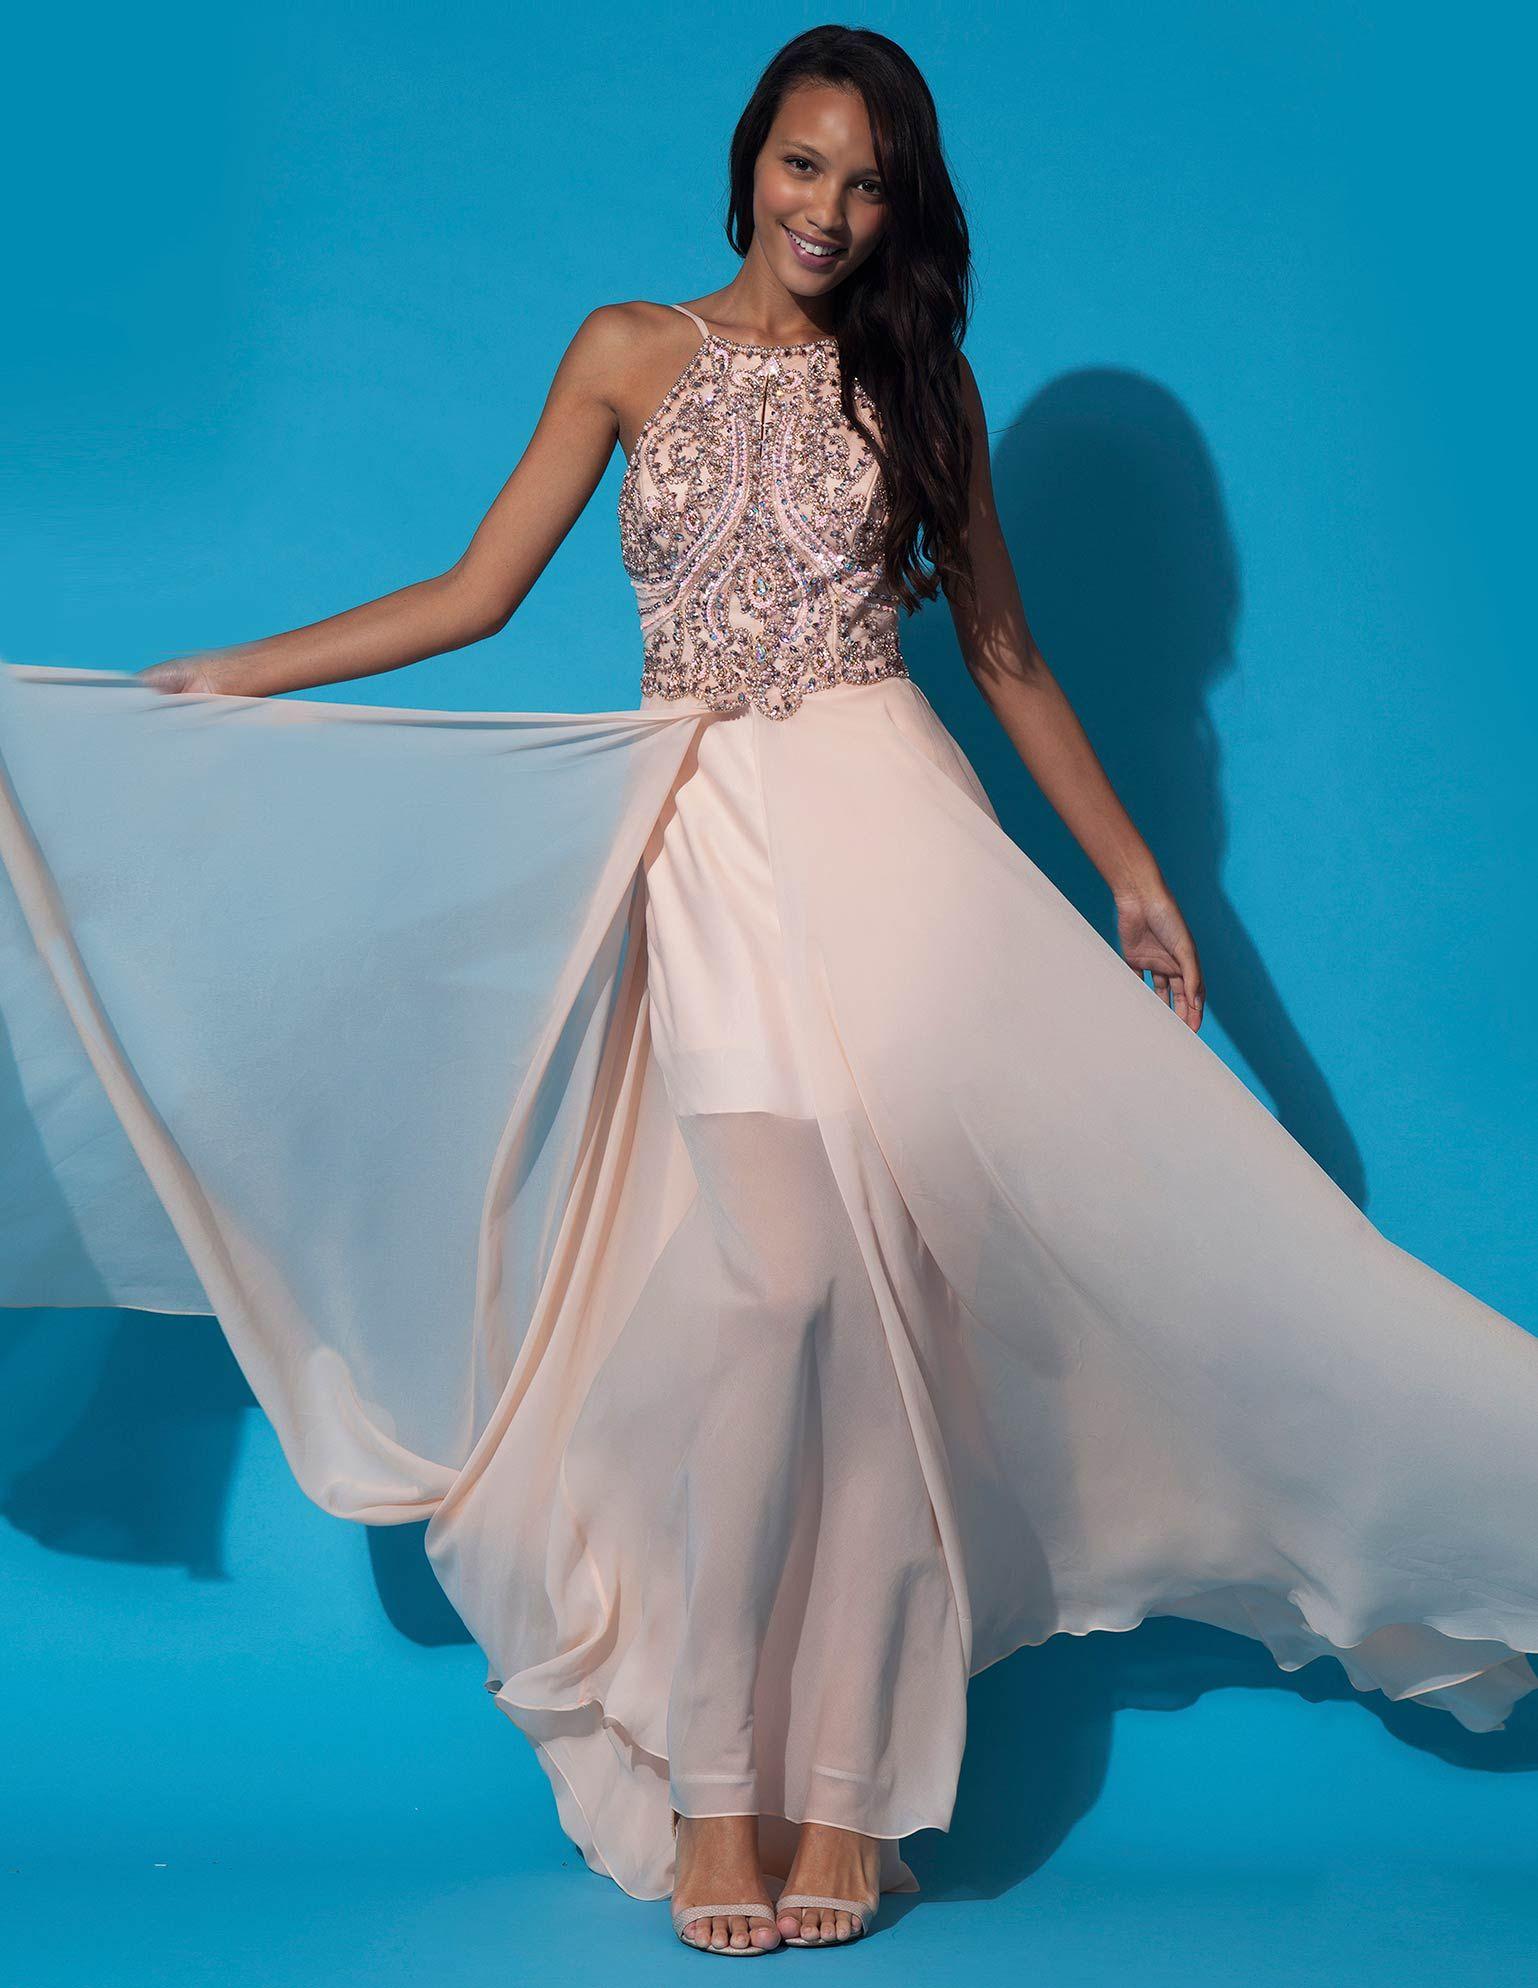 Floor length Jovani dress | Dress Up | Pinterest | Jovani dresses ...